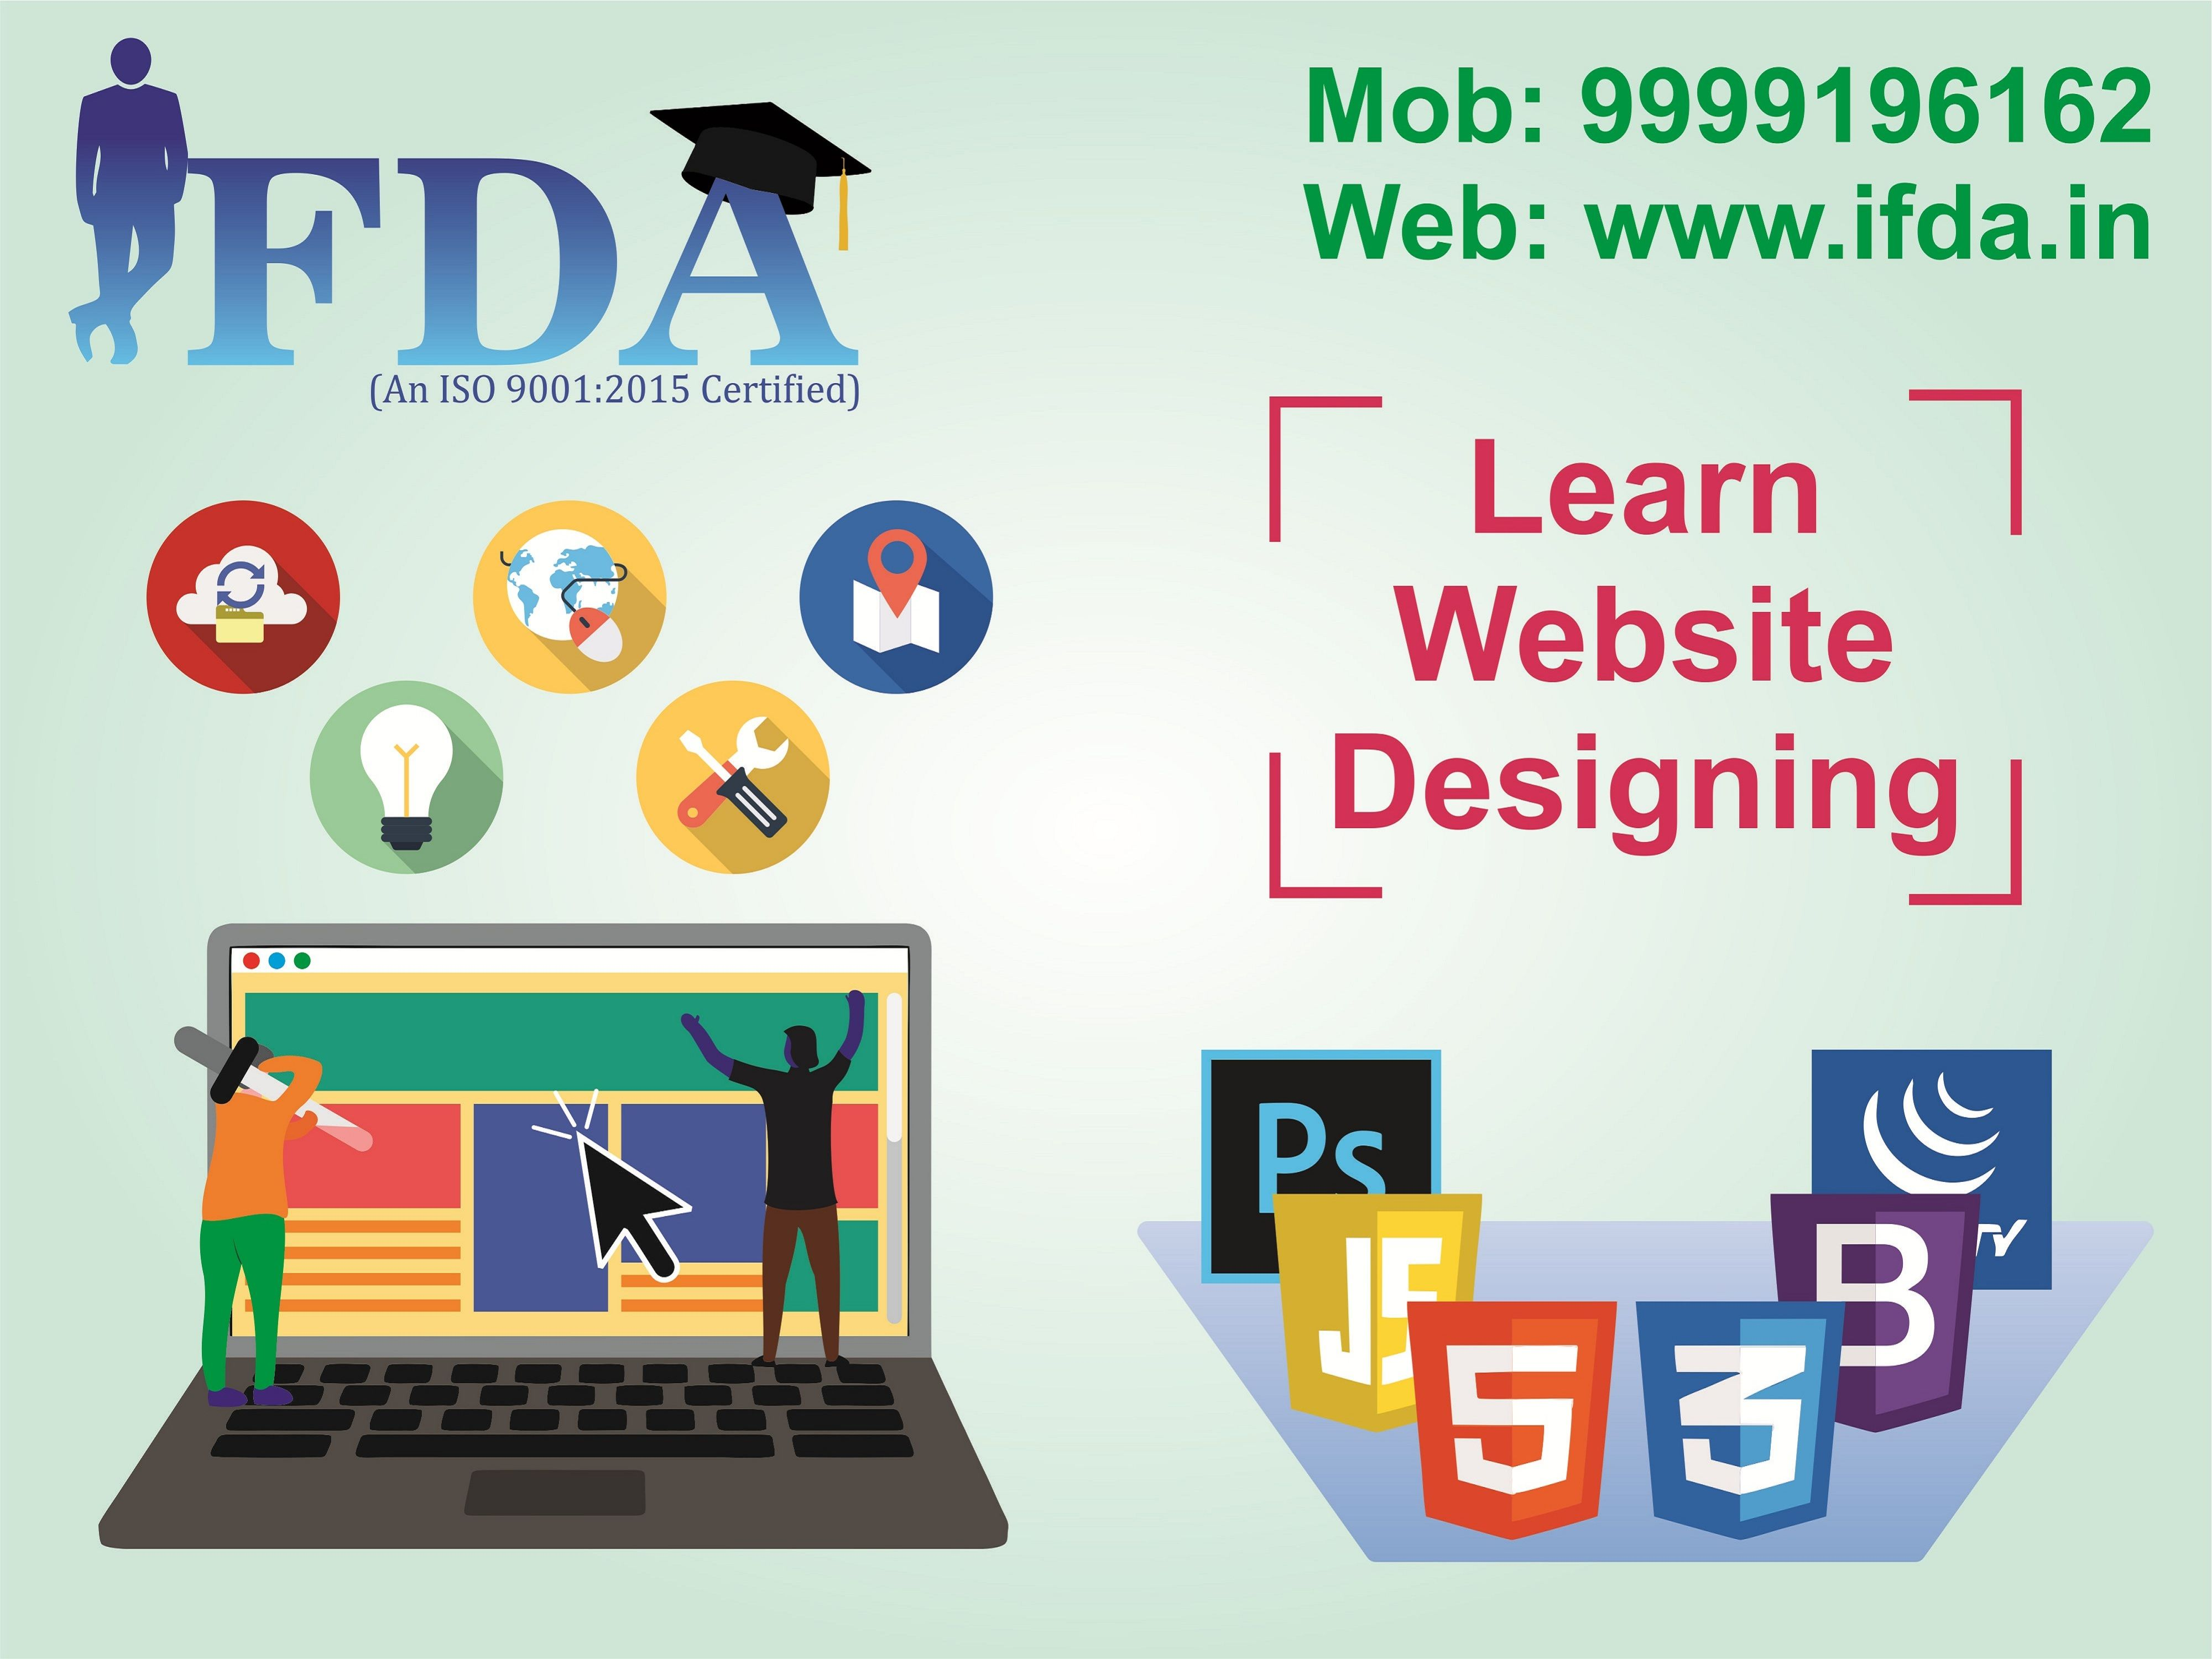 Best Web Designing Training Institute Near Me In Govindpuri South Delhi Get Enrol In The Best Website Designing Course Training In Ka Web Design Web Design Training Best Web Design